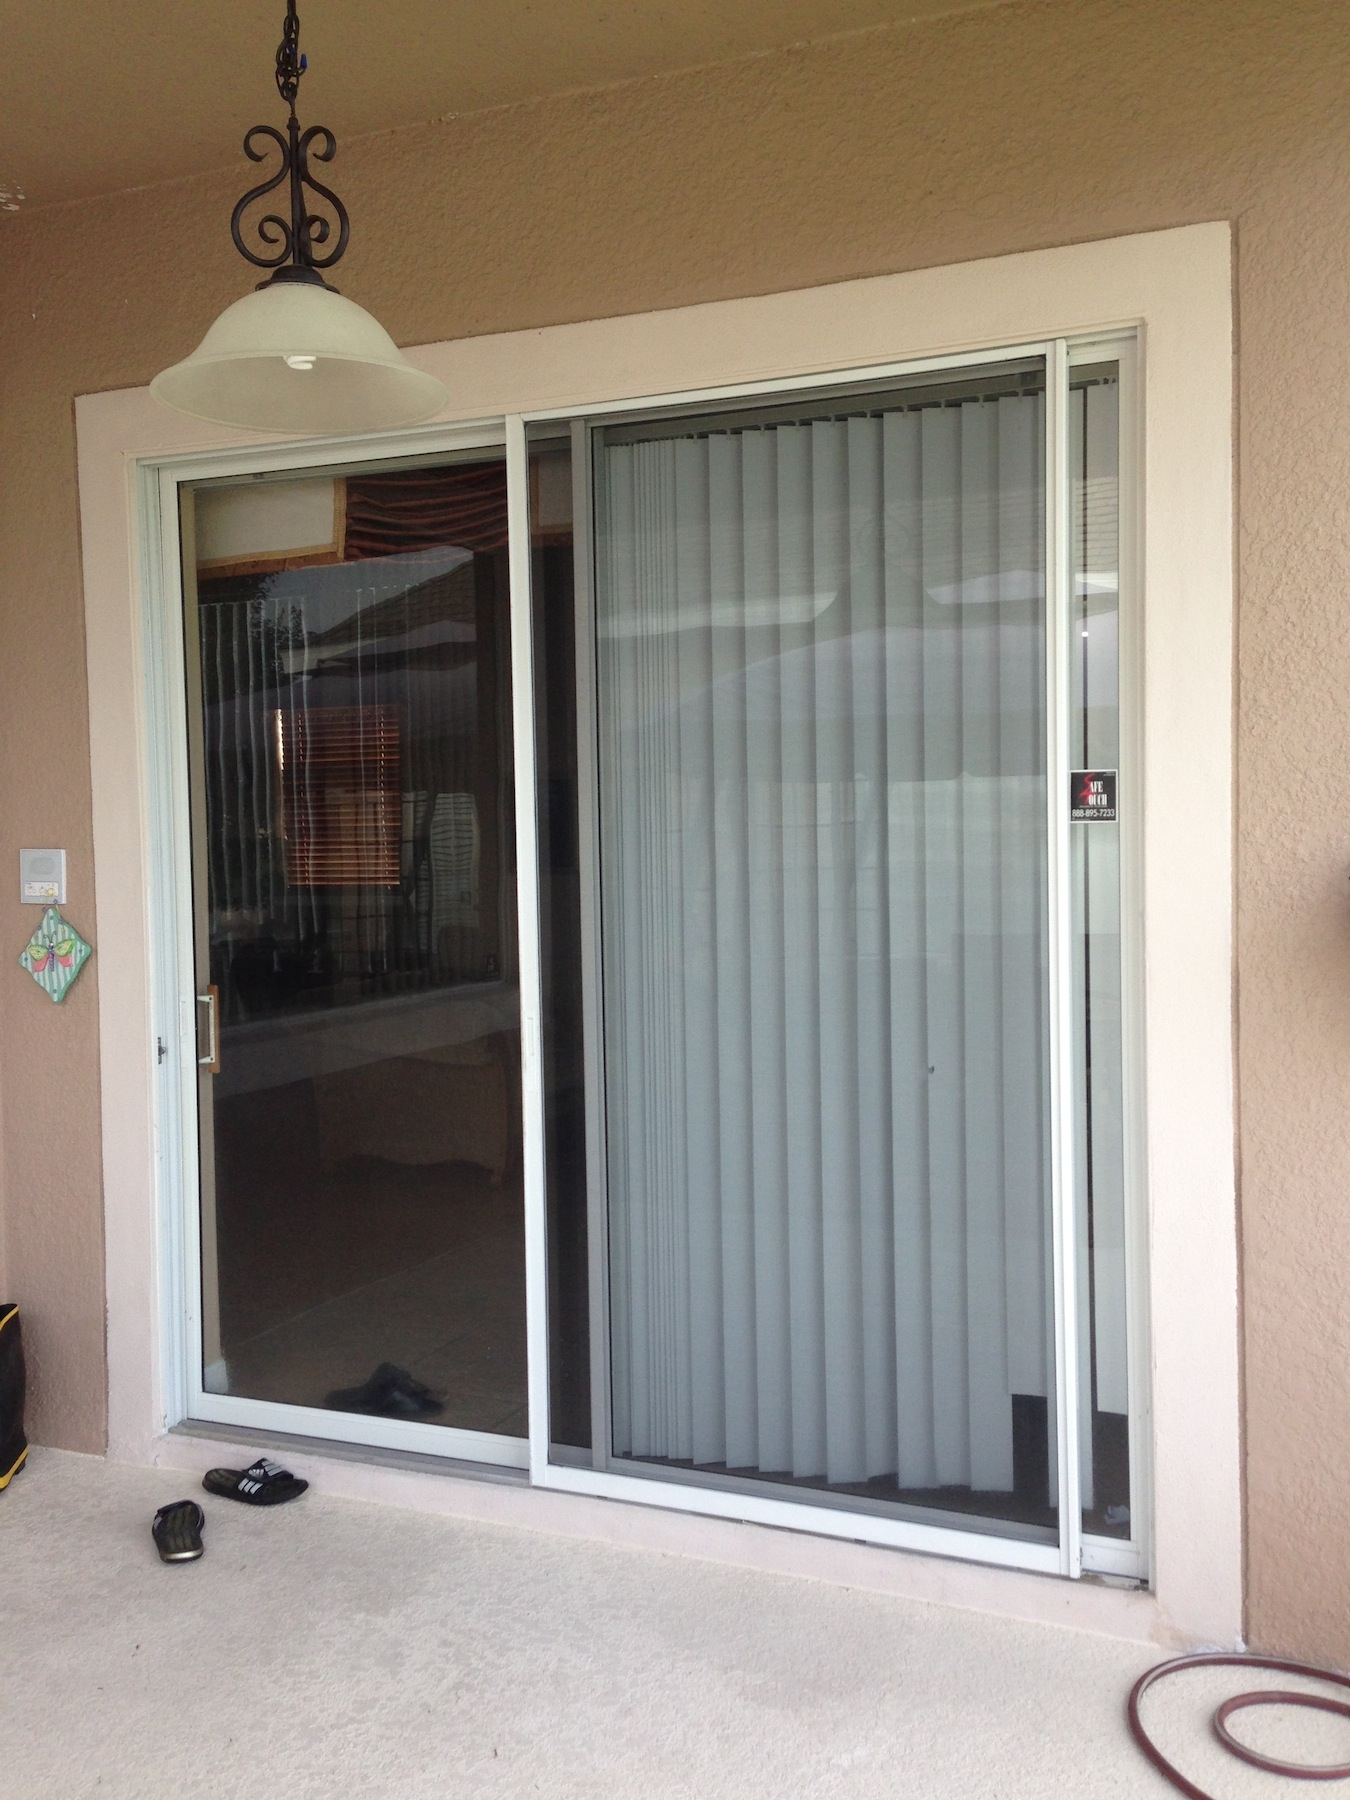 Security Window Film For Sliding Glass Doors1350 X 1800